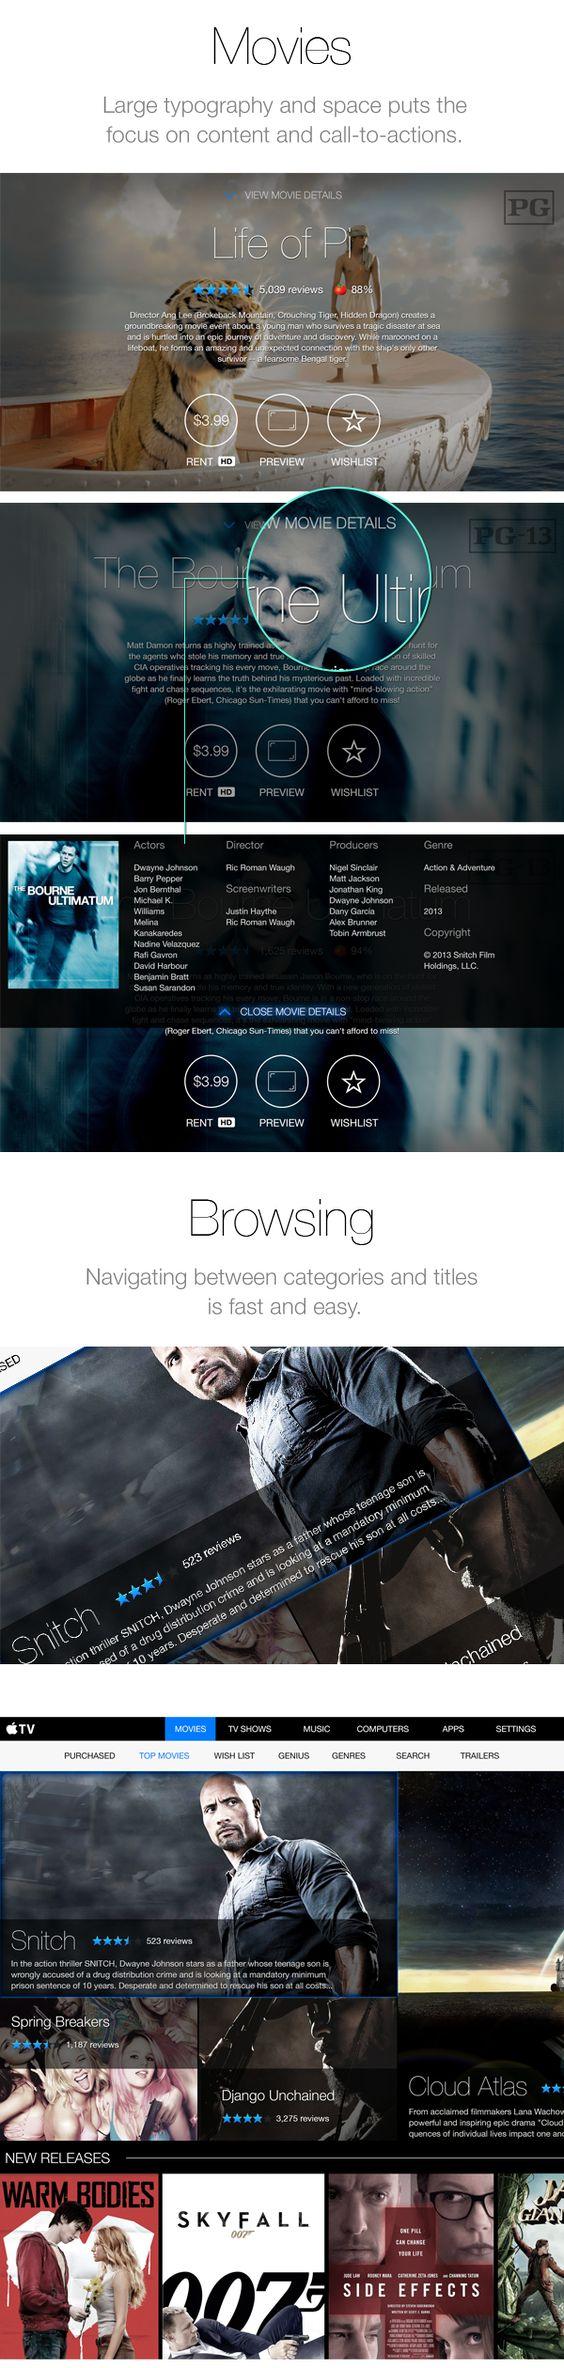 Apple TV Redesign (Concept) - UI/UX by Neil Krishnan, via Behance